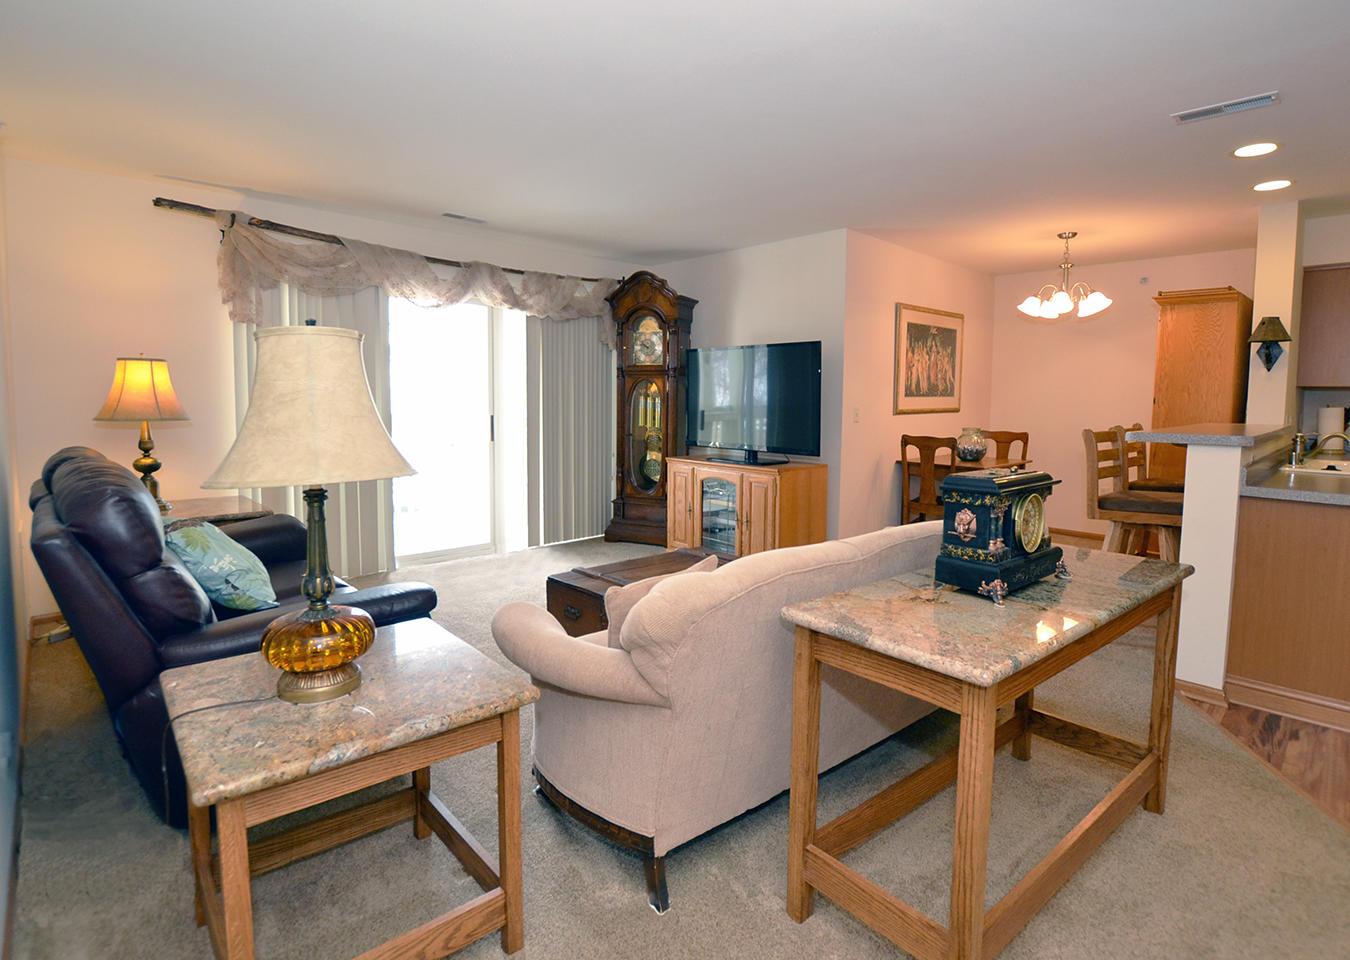 530 Windstone Dr, Hartland, Wisconsin 53029, 2 Bedrooms Bedrooms, 6 Rooms Rooms,2 BathroomsBathrooms,Condominiums,For Sale,Windstone Dr,2,1728823